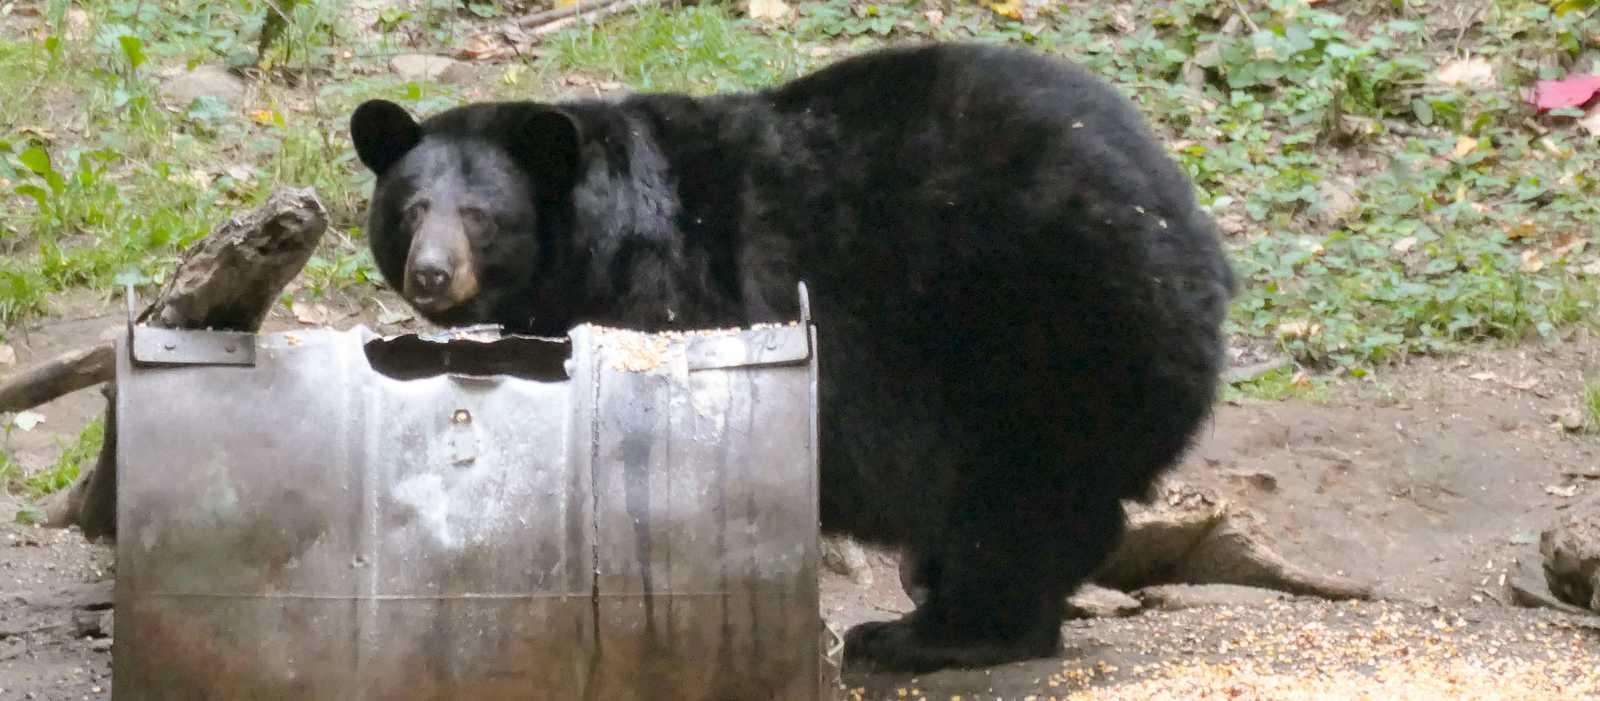 Bärenbeobachtung in Saint-Alexis-des-Monts